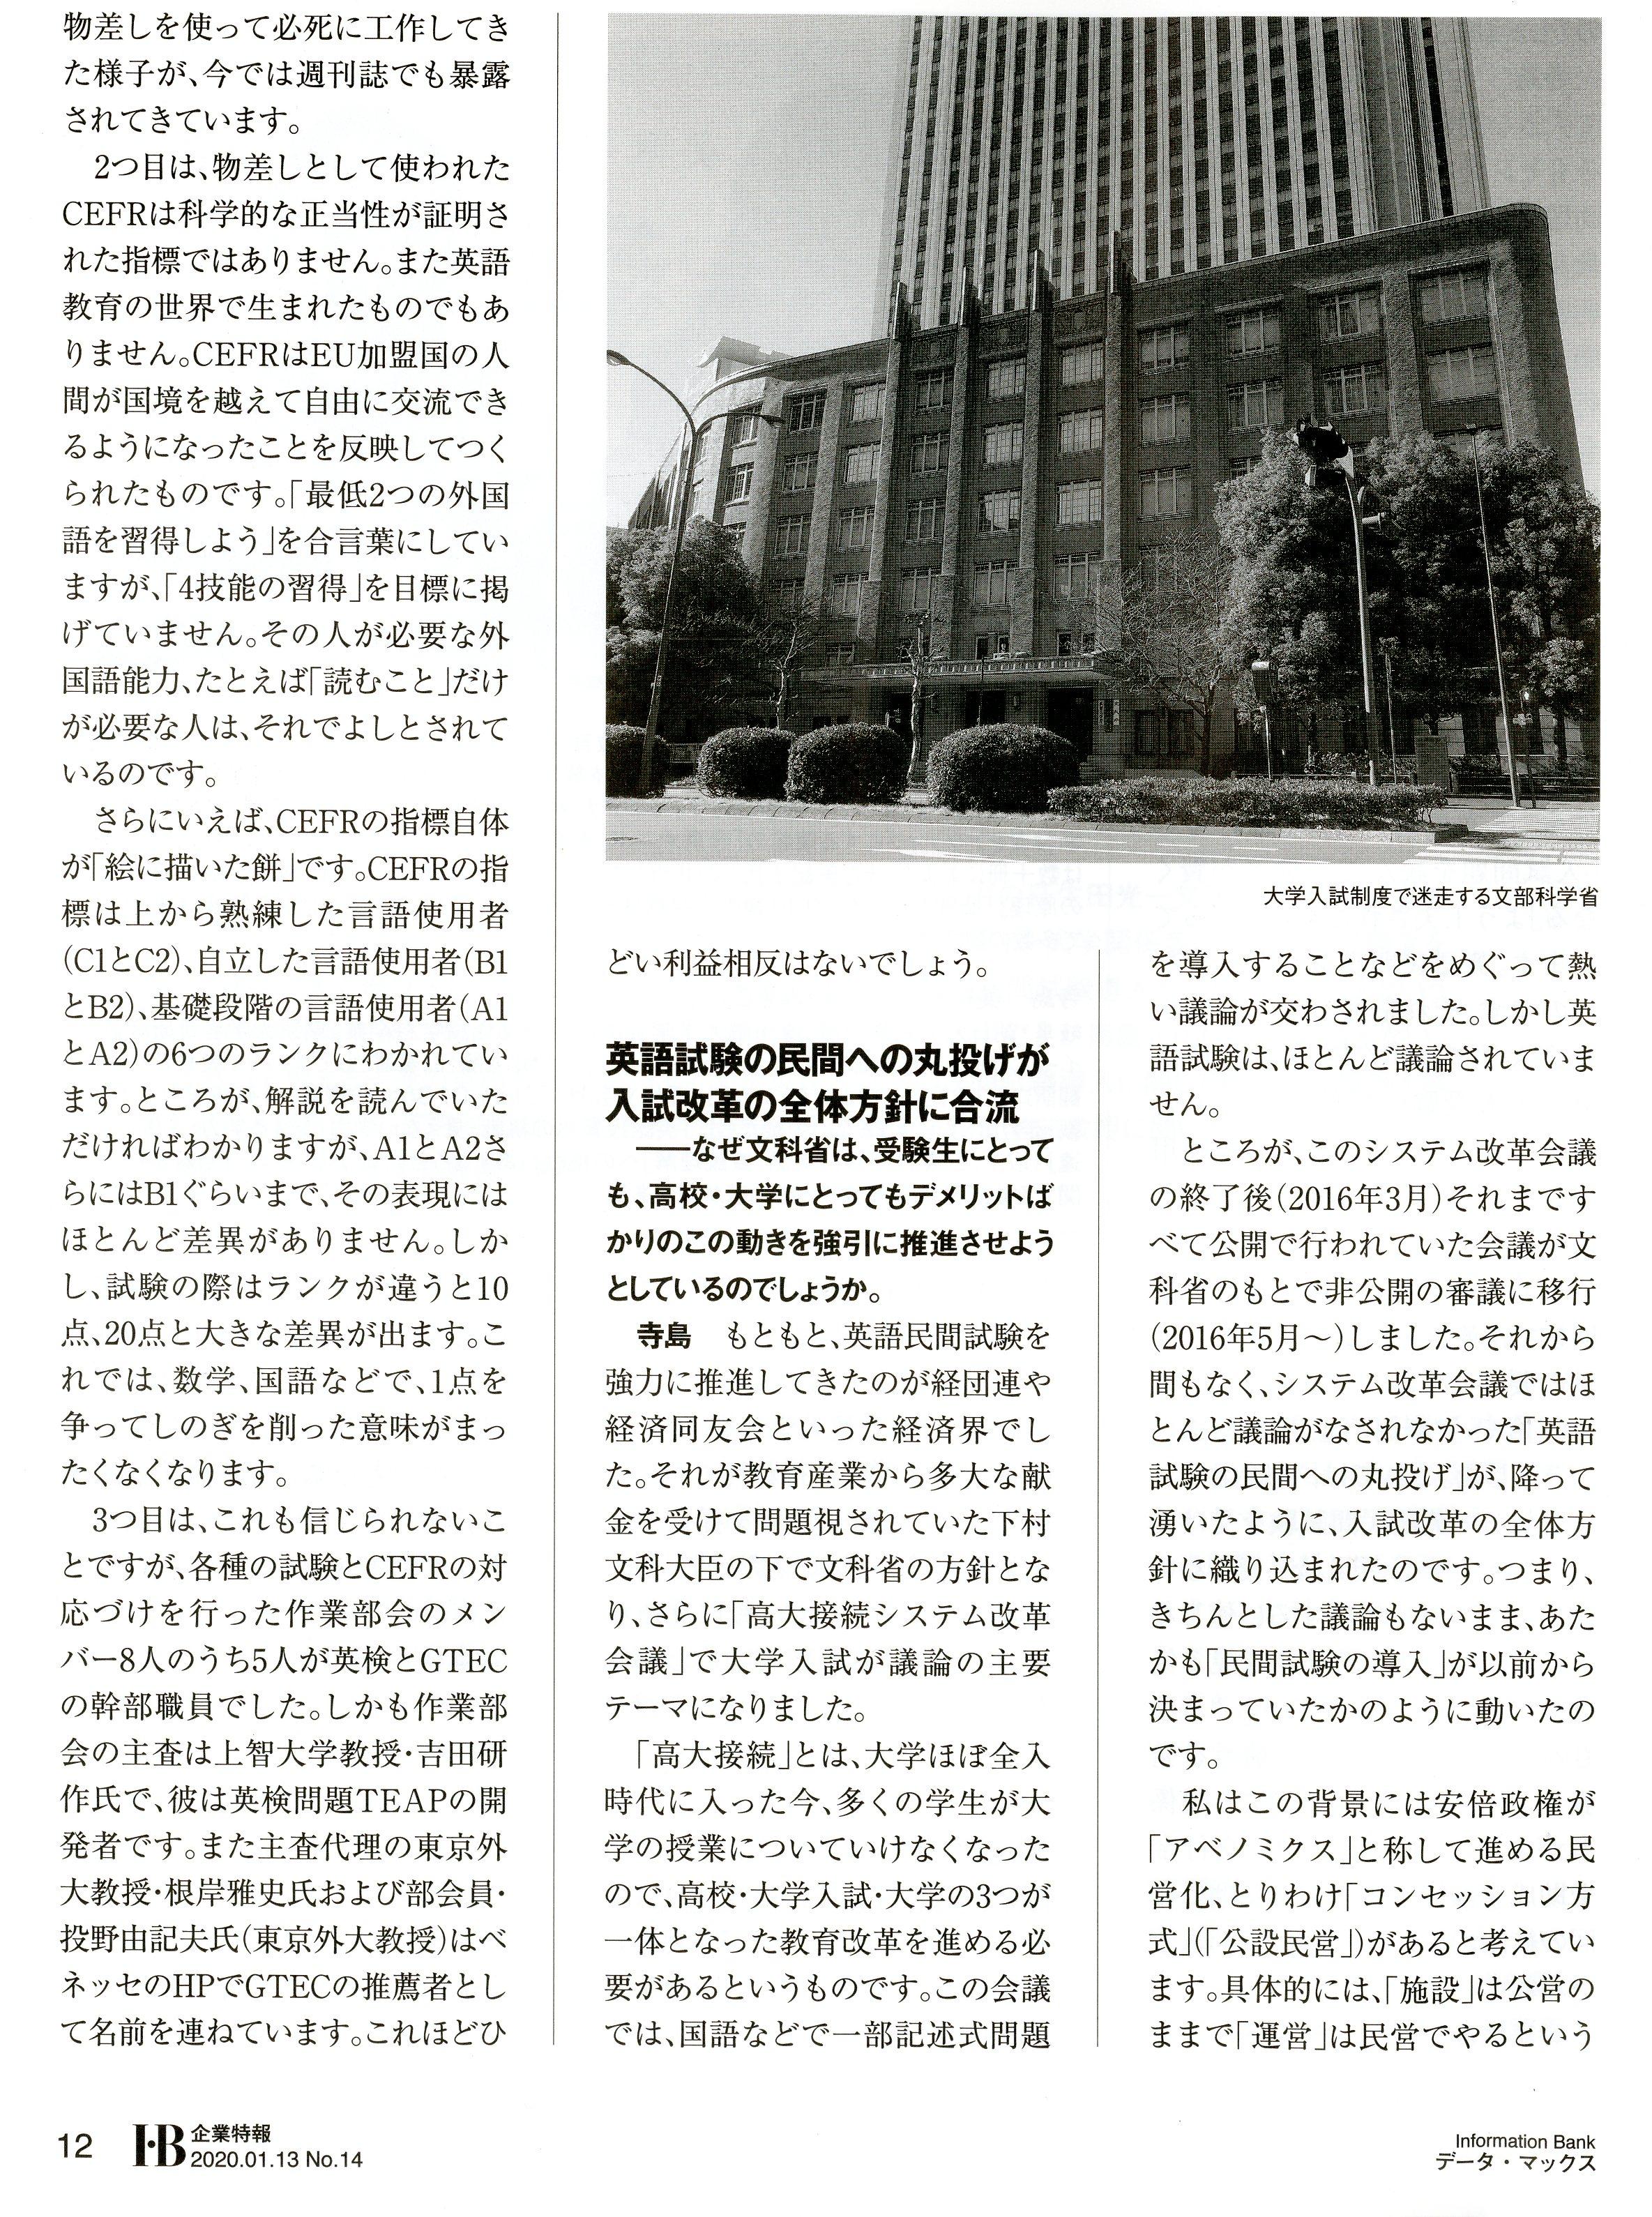 IB TOKYO 20200113 3